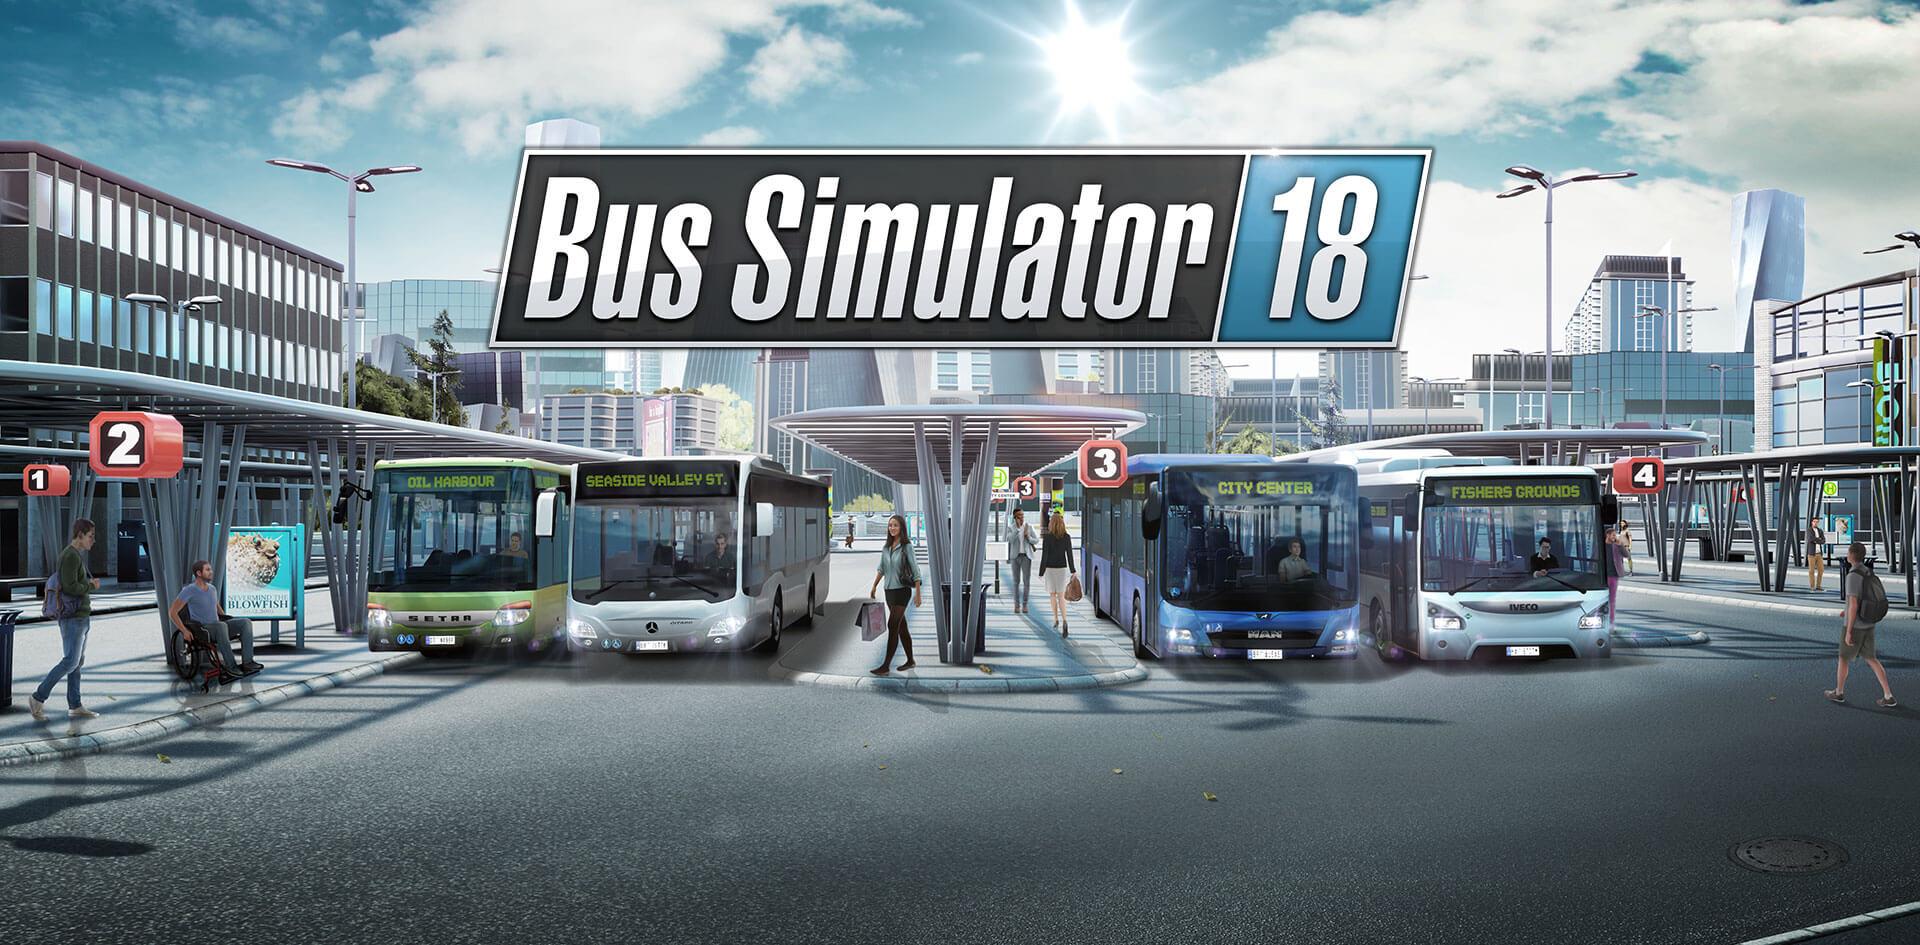 in Q2 2019 on Bus Simulator 18 - Roadmap (PC) Update #7 (Various Bug Fixes - Released: May 22, 2019) on Bus Simulator 18 - Roadmap (PC) Update #7 (Various Bug Fixes - Released: May 22, 2019)